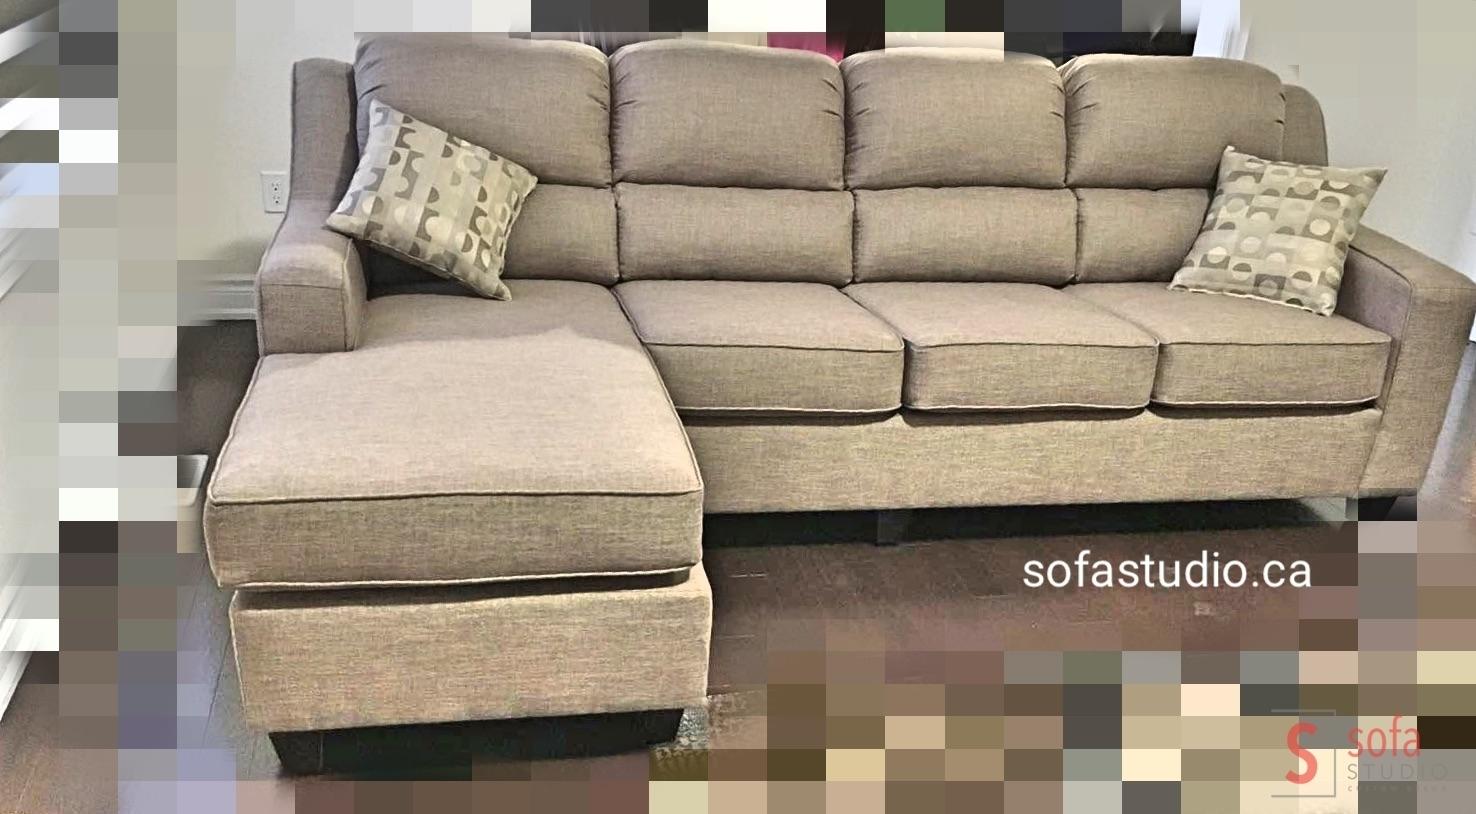 Modern Sofa Design In Leather , Sofa Factory Brampton , Custom regarding Sectional Sofas At Brampton (Image 10 of 15)